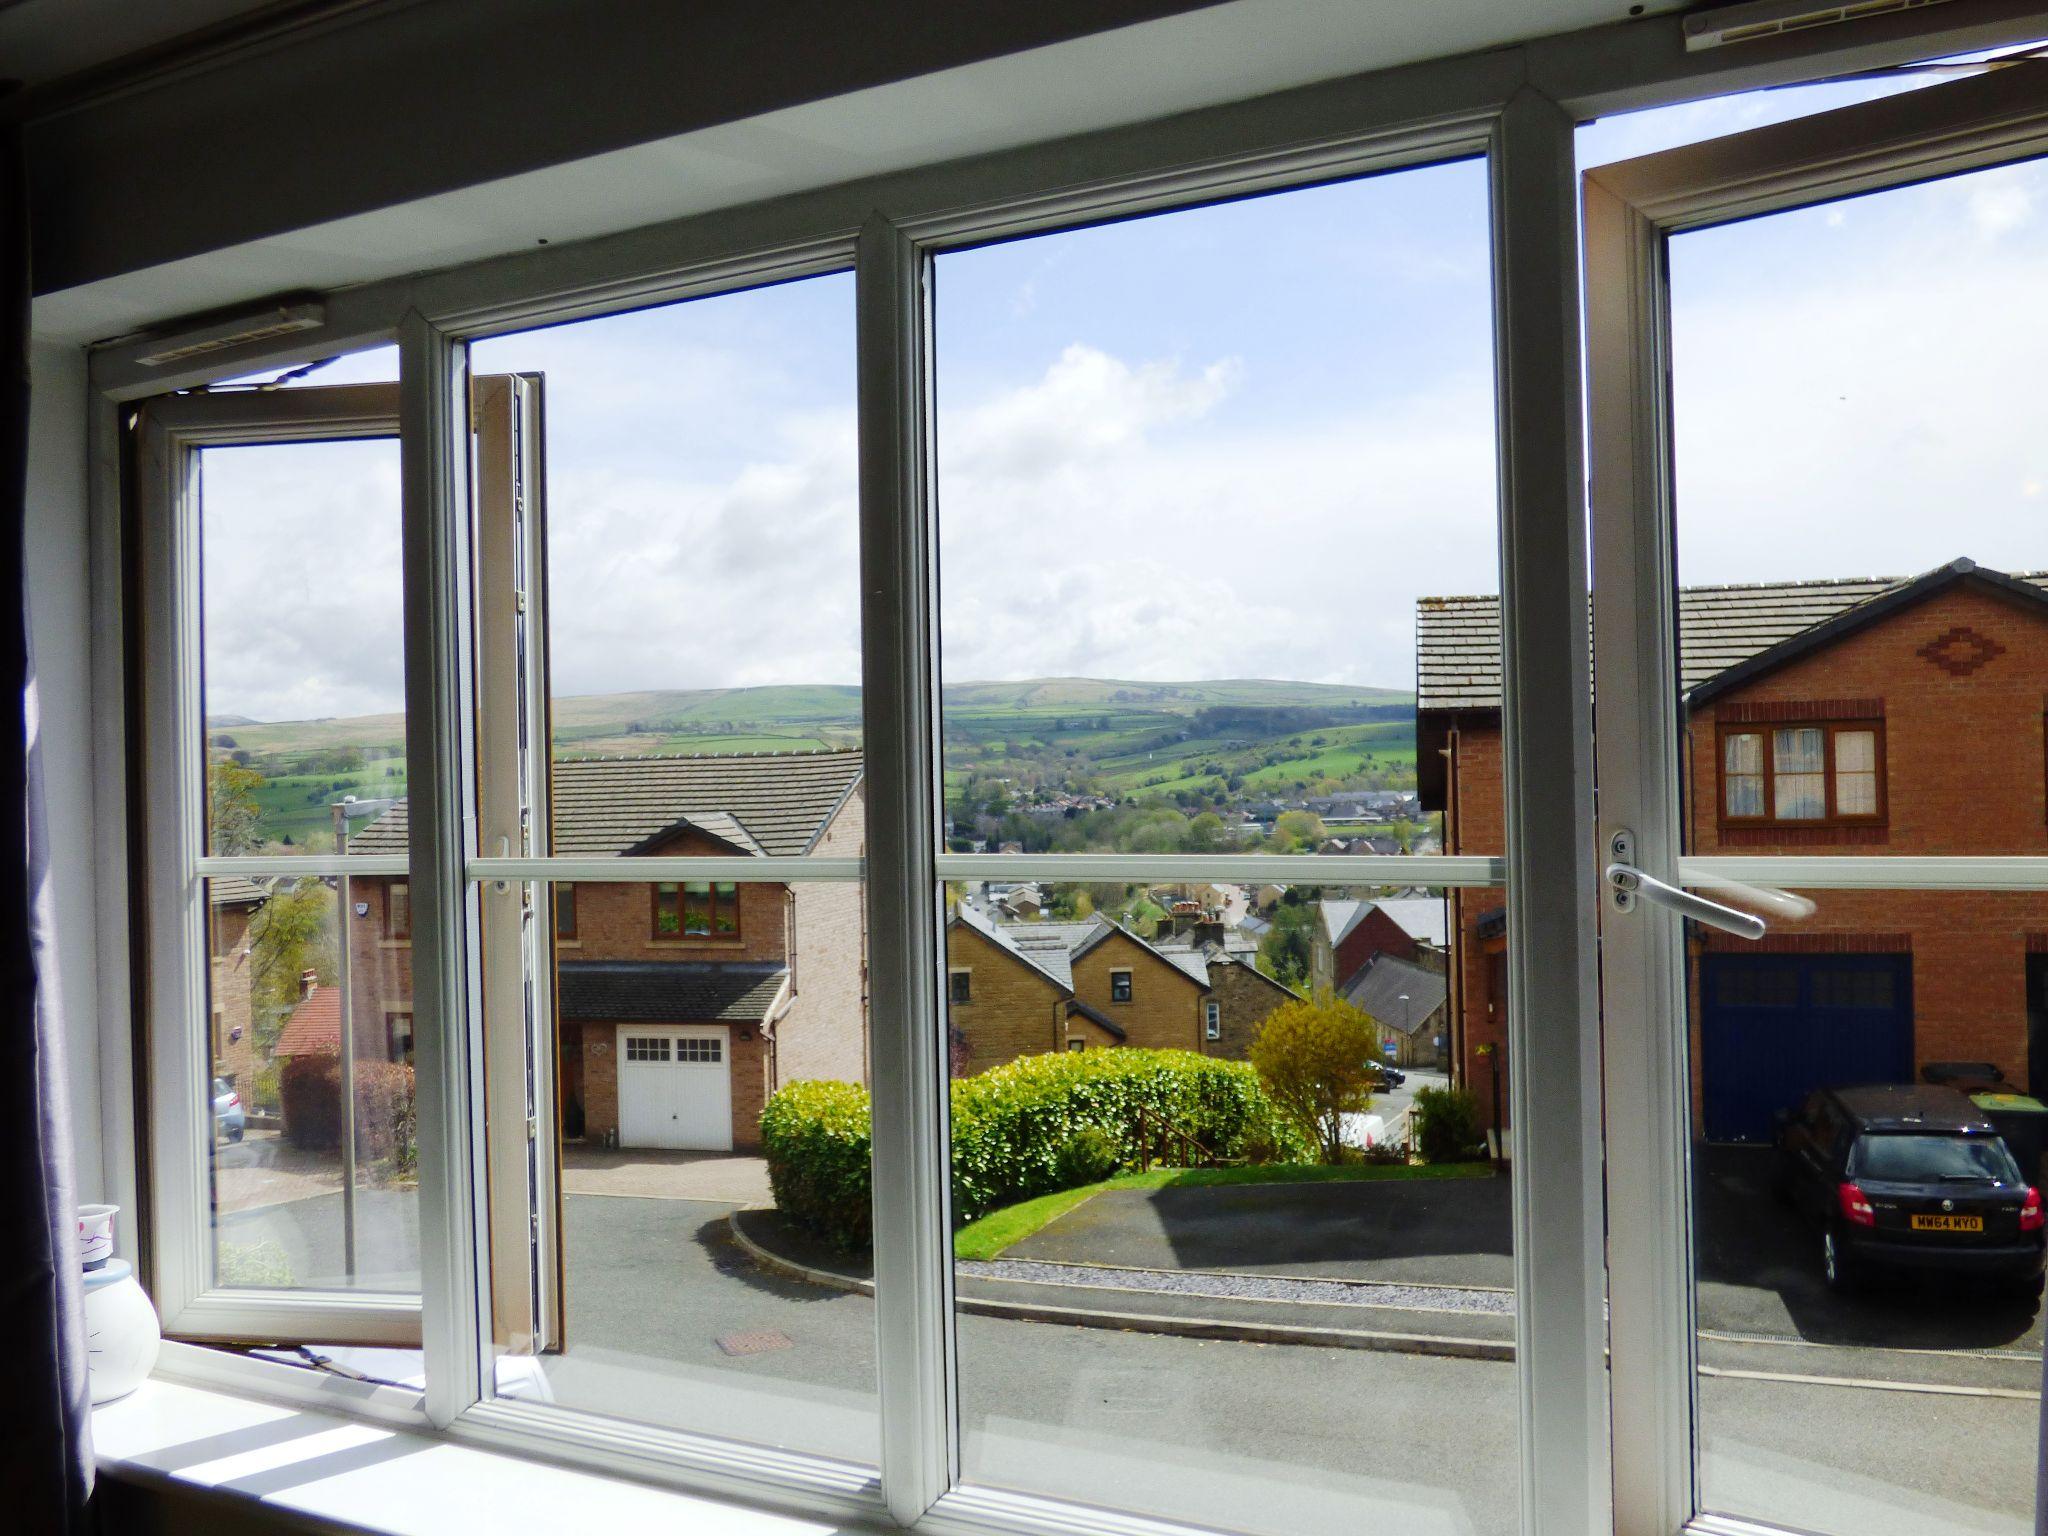 4 Bedroom Semi-detached House For Sale - Lounge Windows